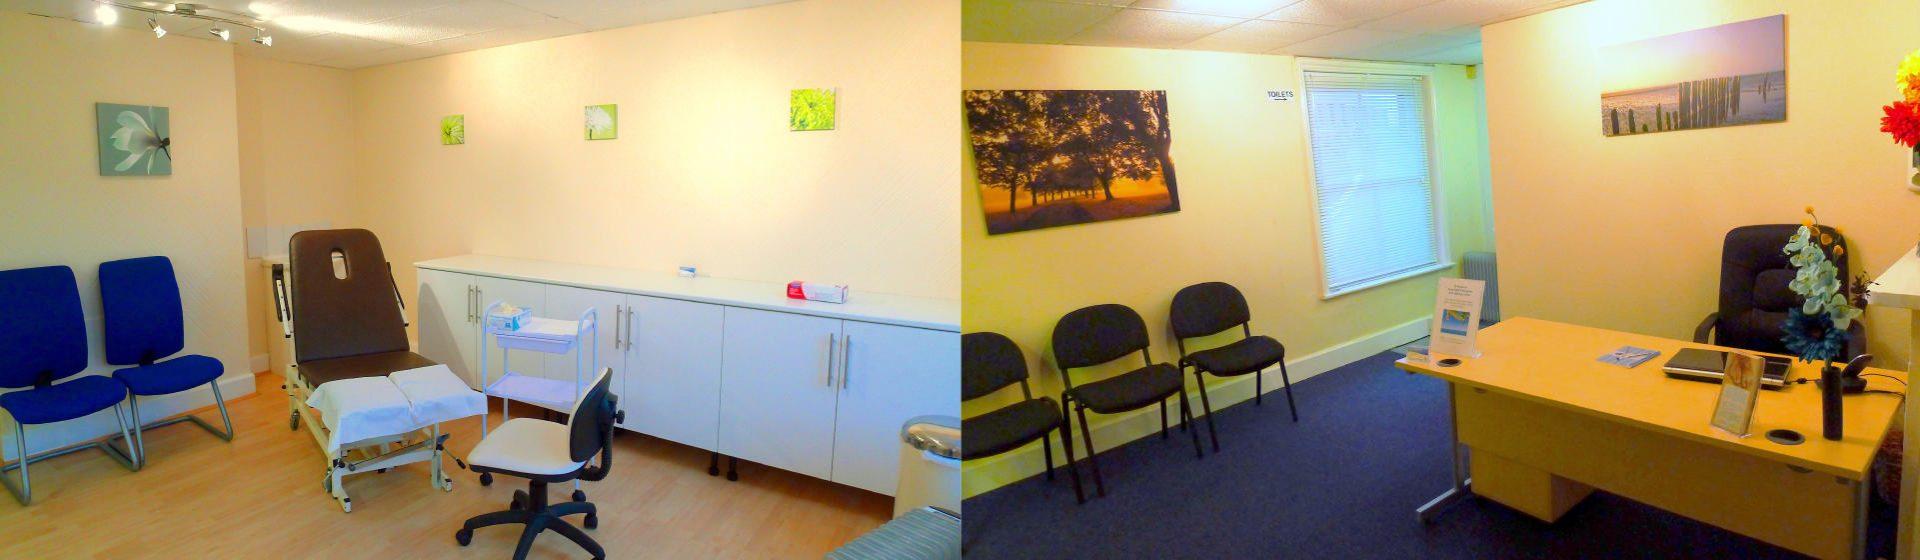 Chiropodist | Podiatrist | Petersfield Chiropody & Podiatry Centre